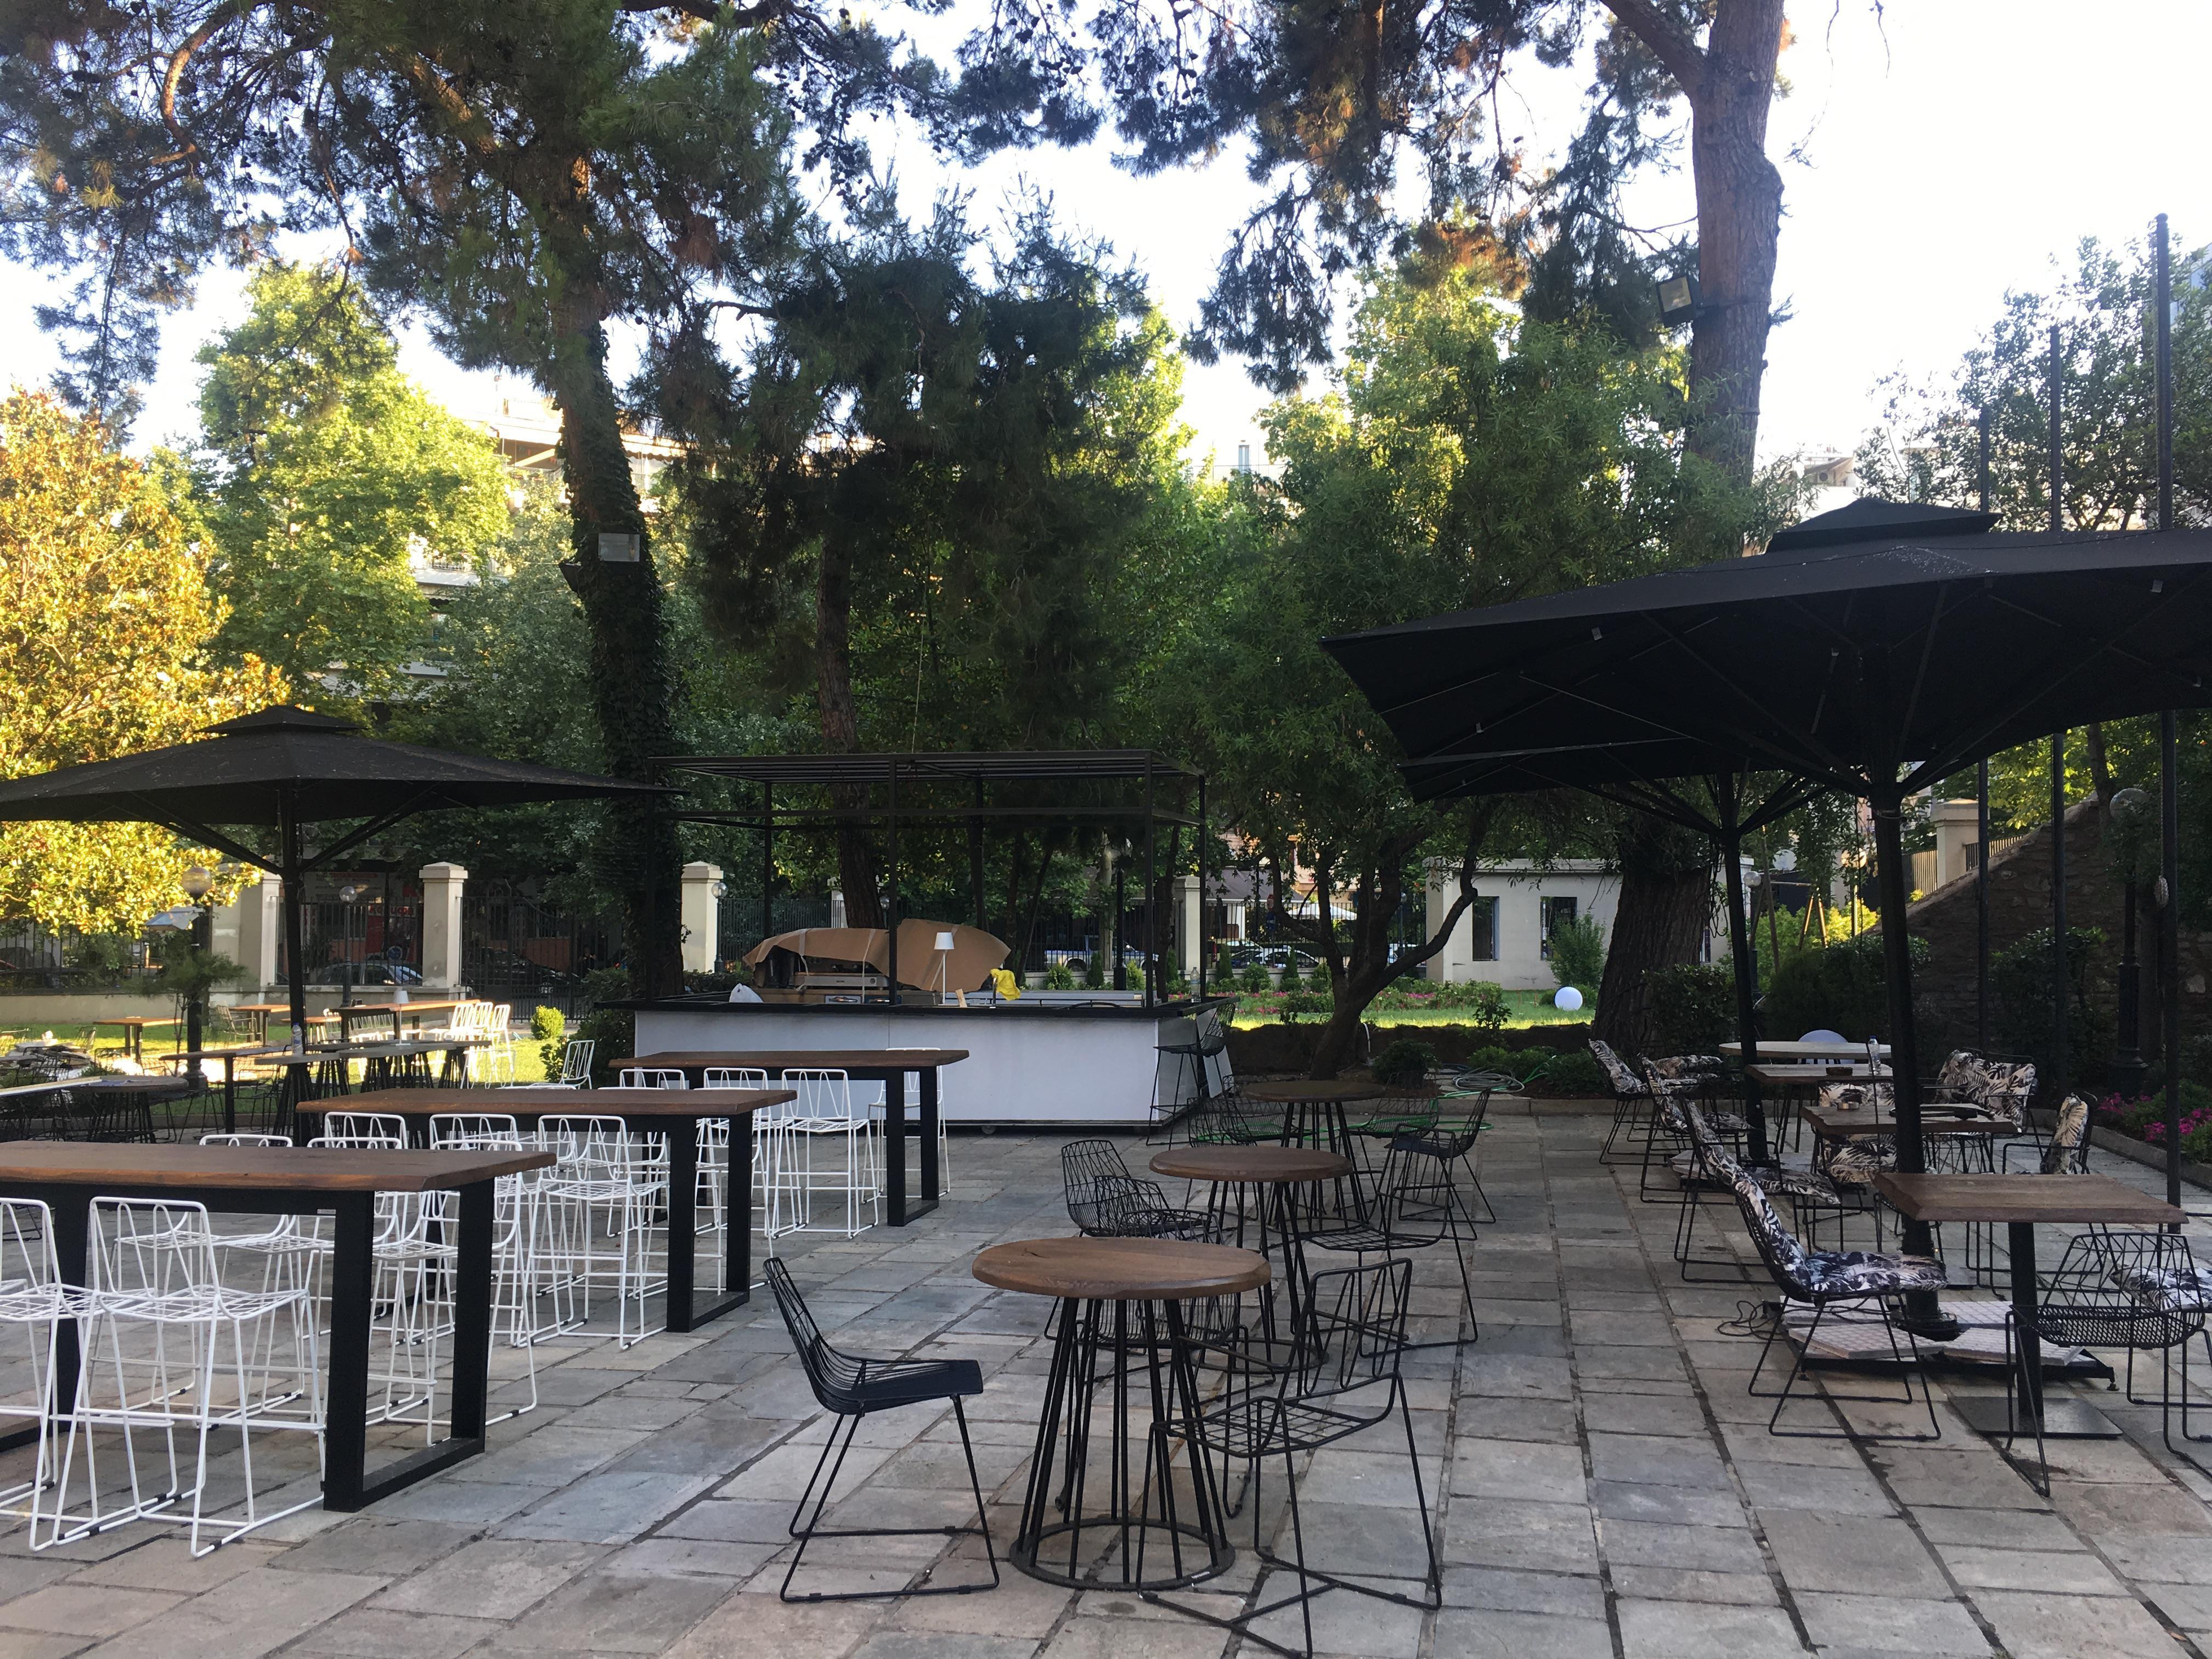 76e5451ac2a Ένα νέο καφέ αποκτά τις επόμενες μέρες ο κήπος της Βίλας Μπιάνκα, στη  λεωφόρο των εξοχών. Πρόκειται για την υλοποίηση της απόφασης του δήμου  Θεσσαλονίκης να ...